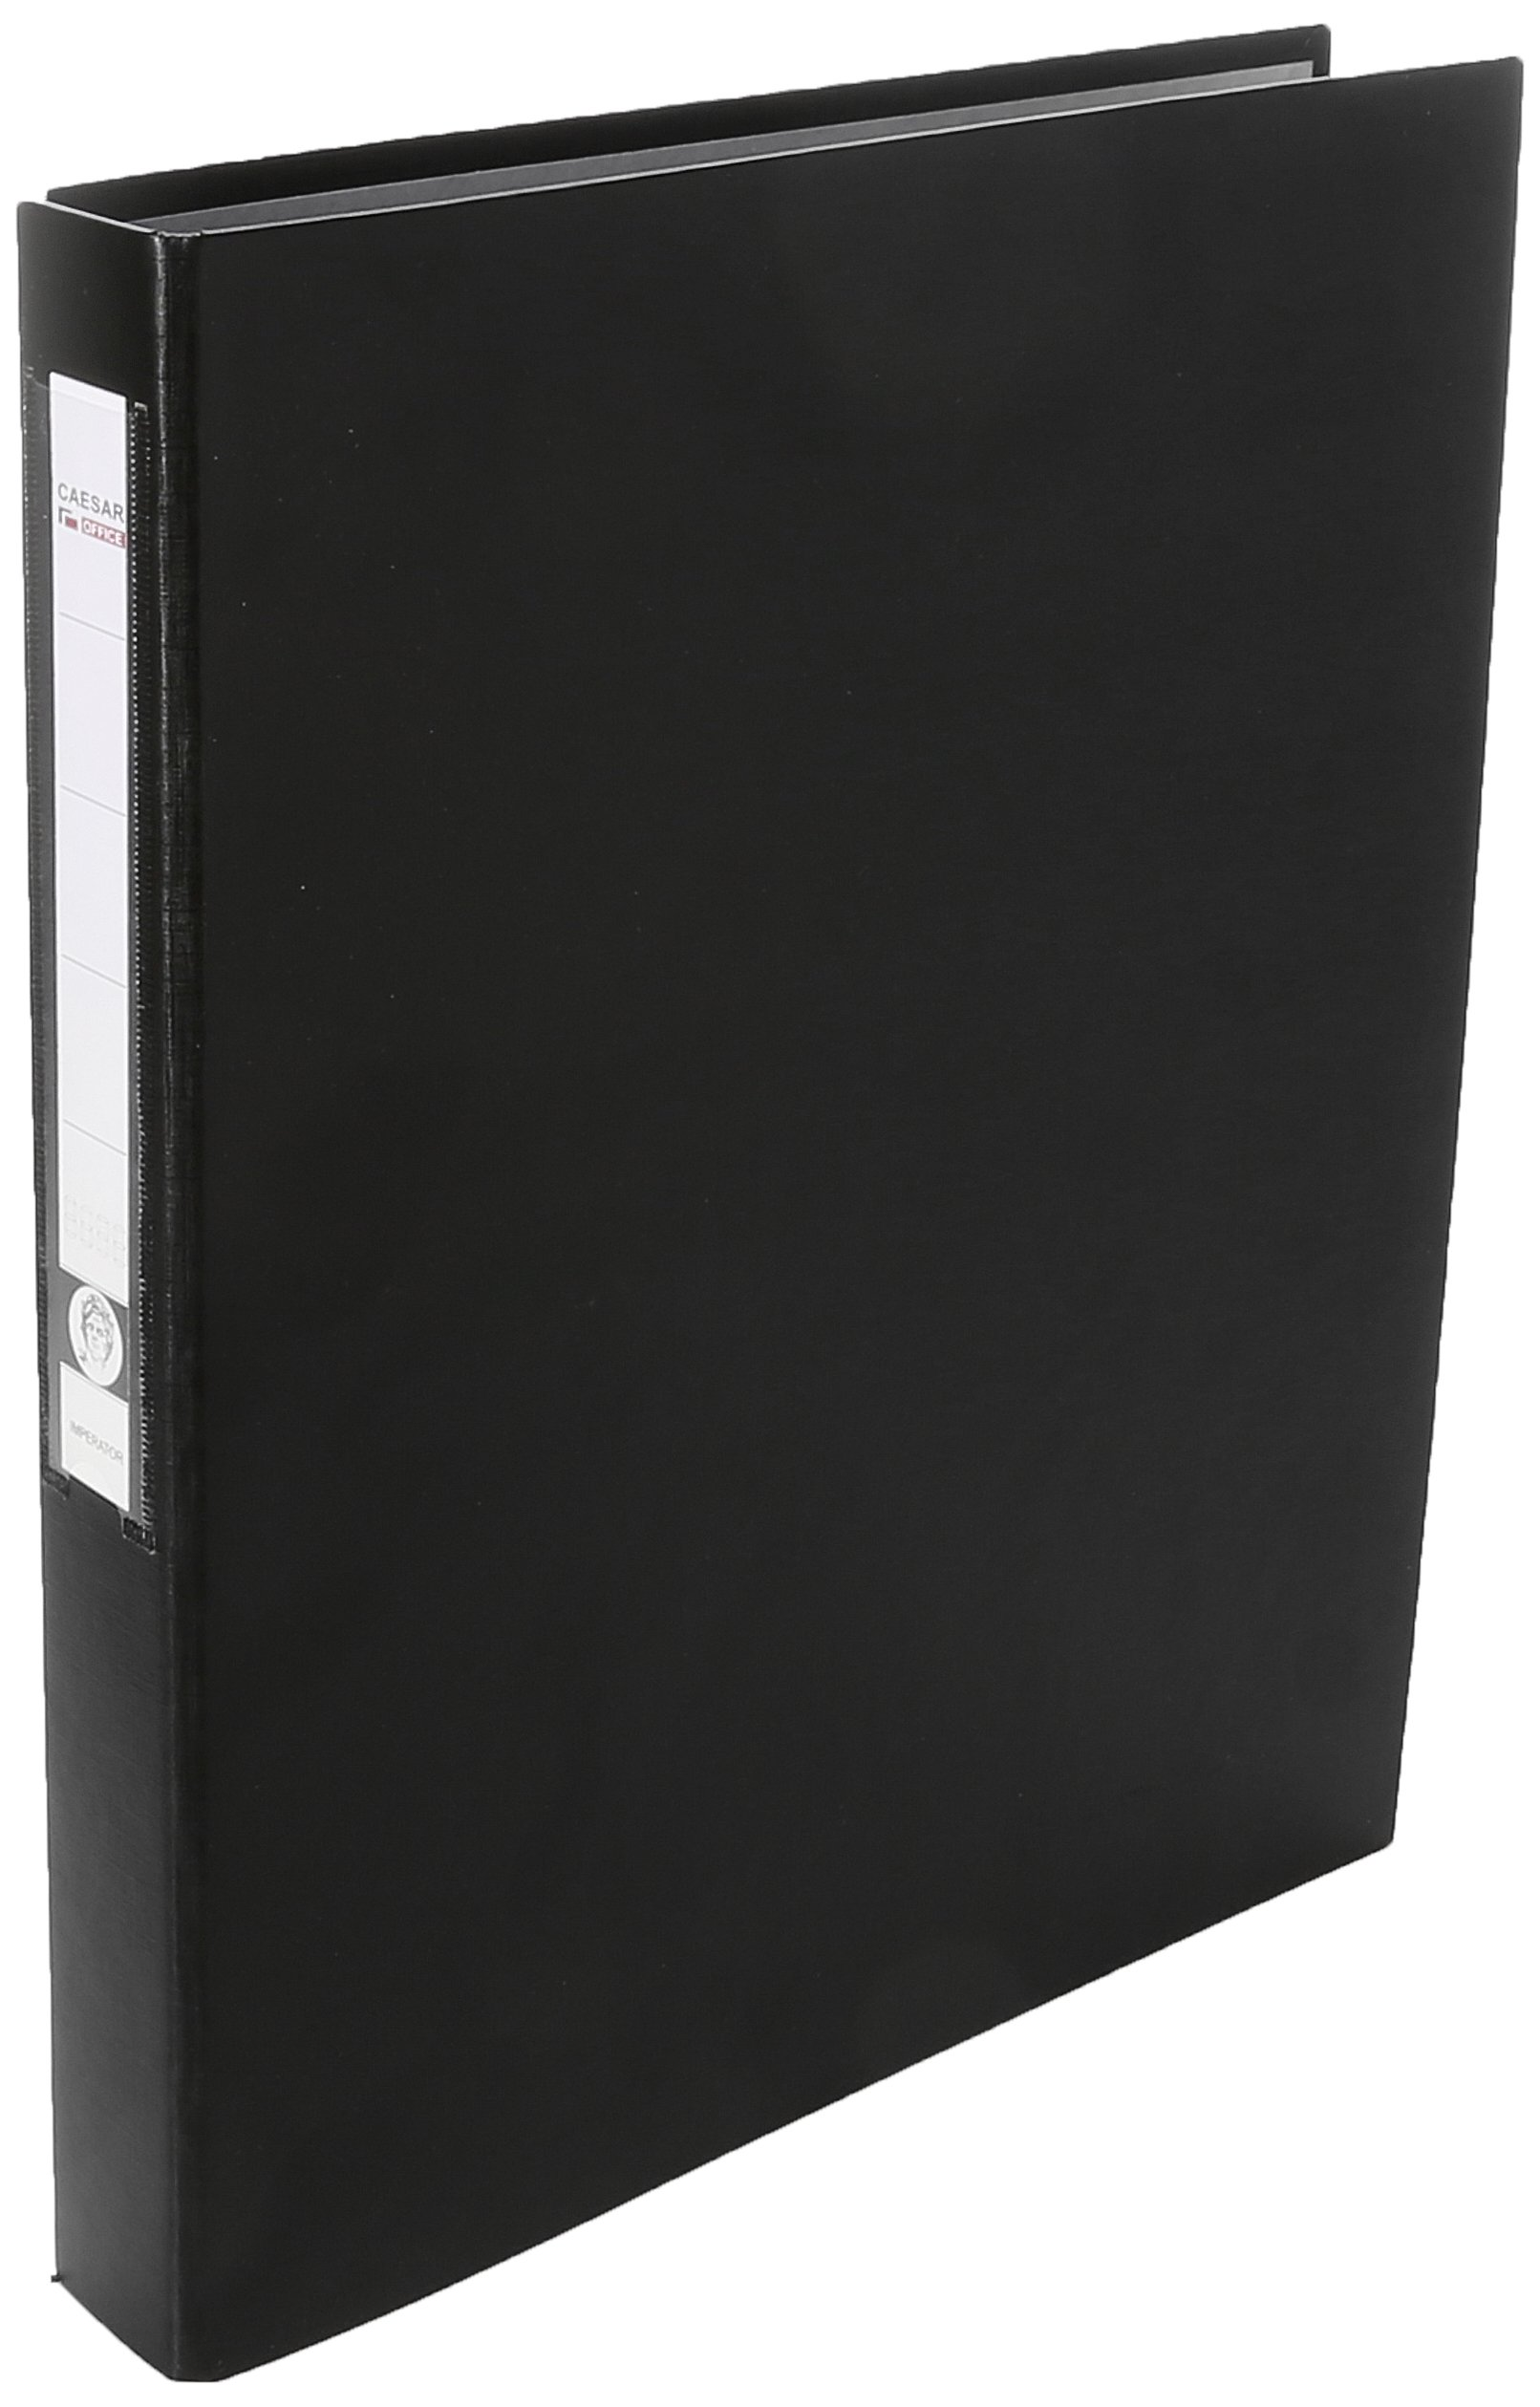 Professional Polypropylene 4 Ring A4 Binder Folder